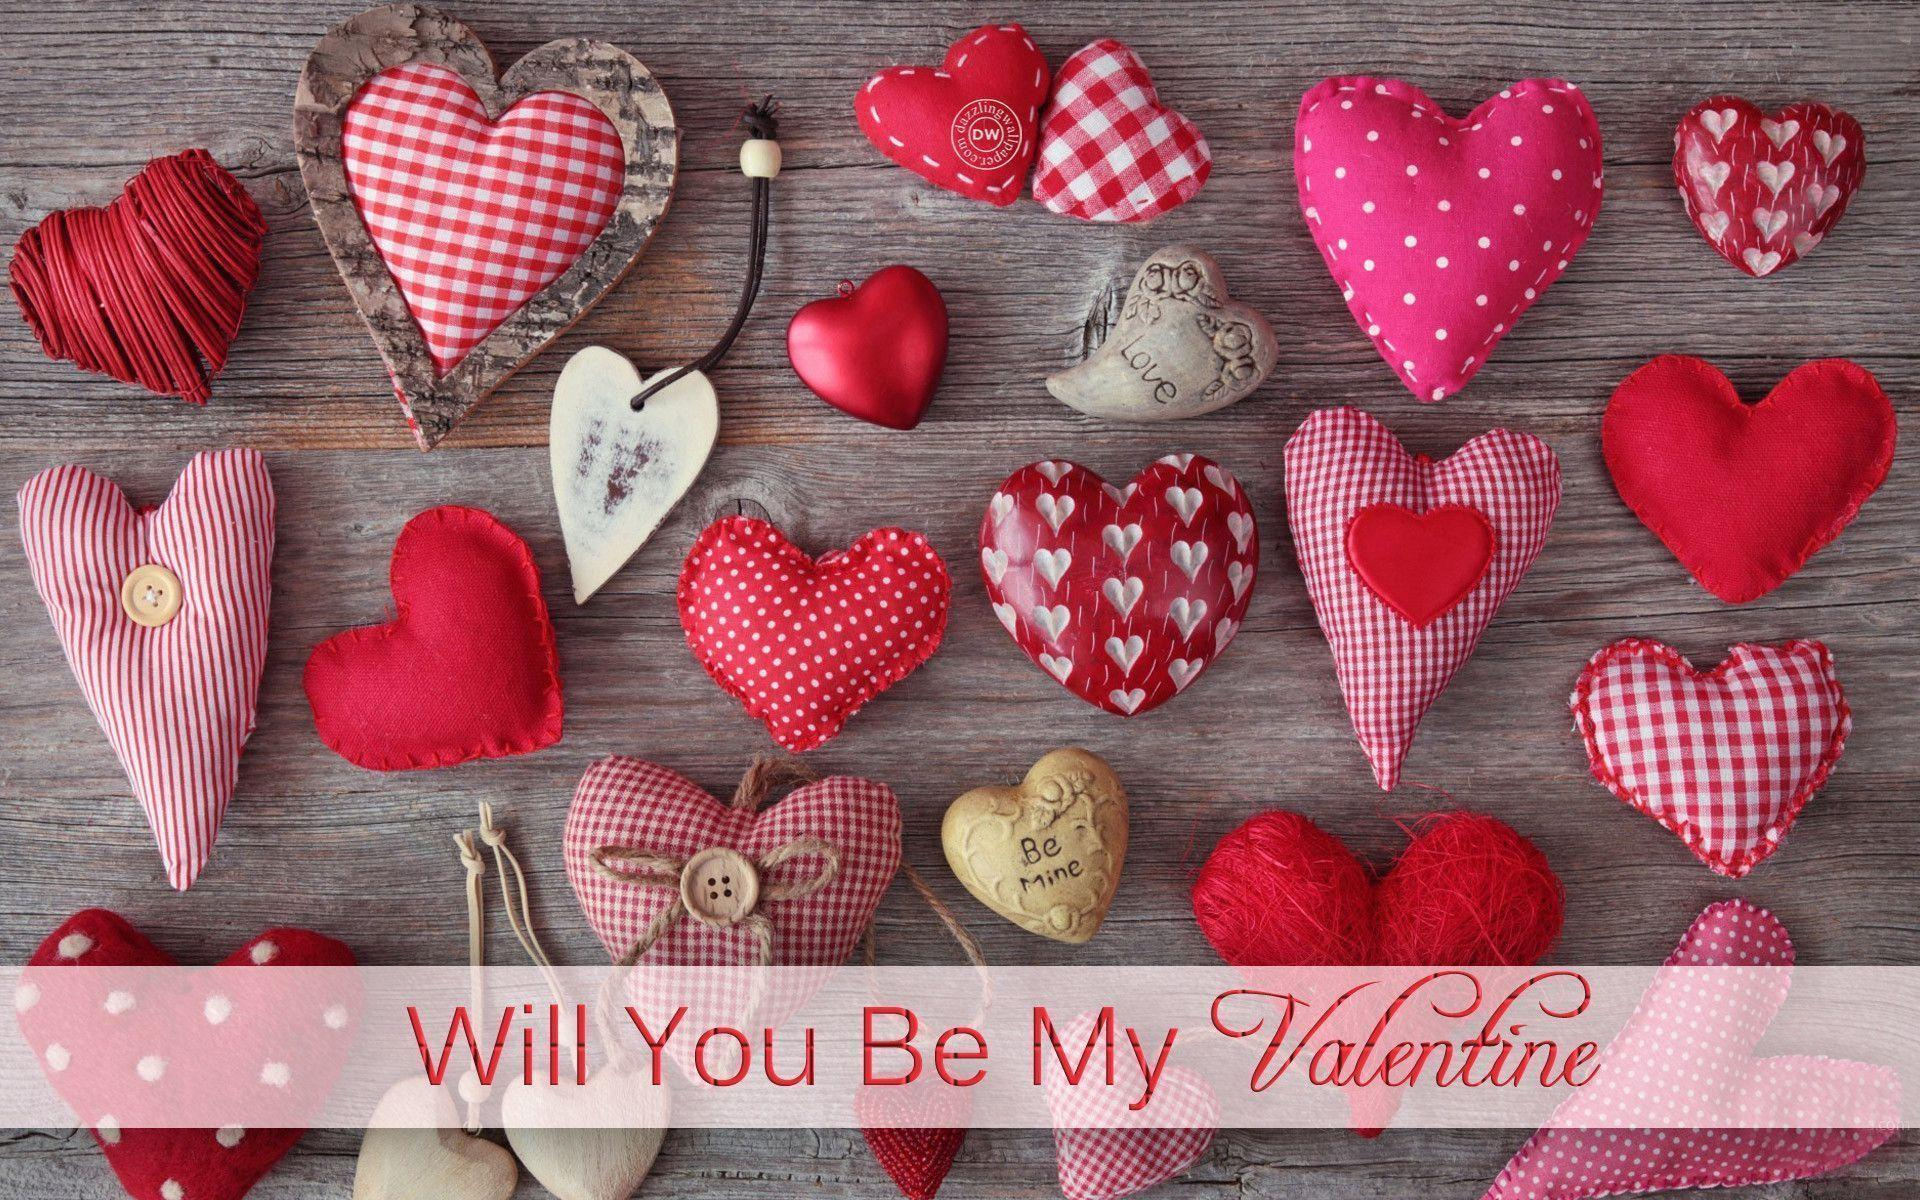 Cute valentines day wallpapers wallpaper cave - San valentin desktop backgrounds ...